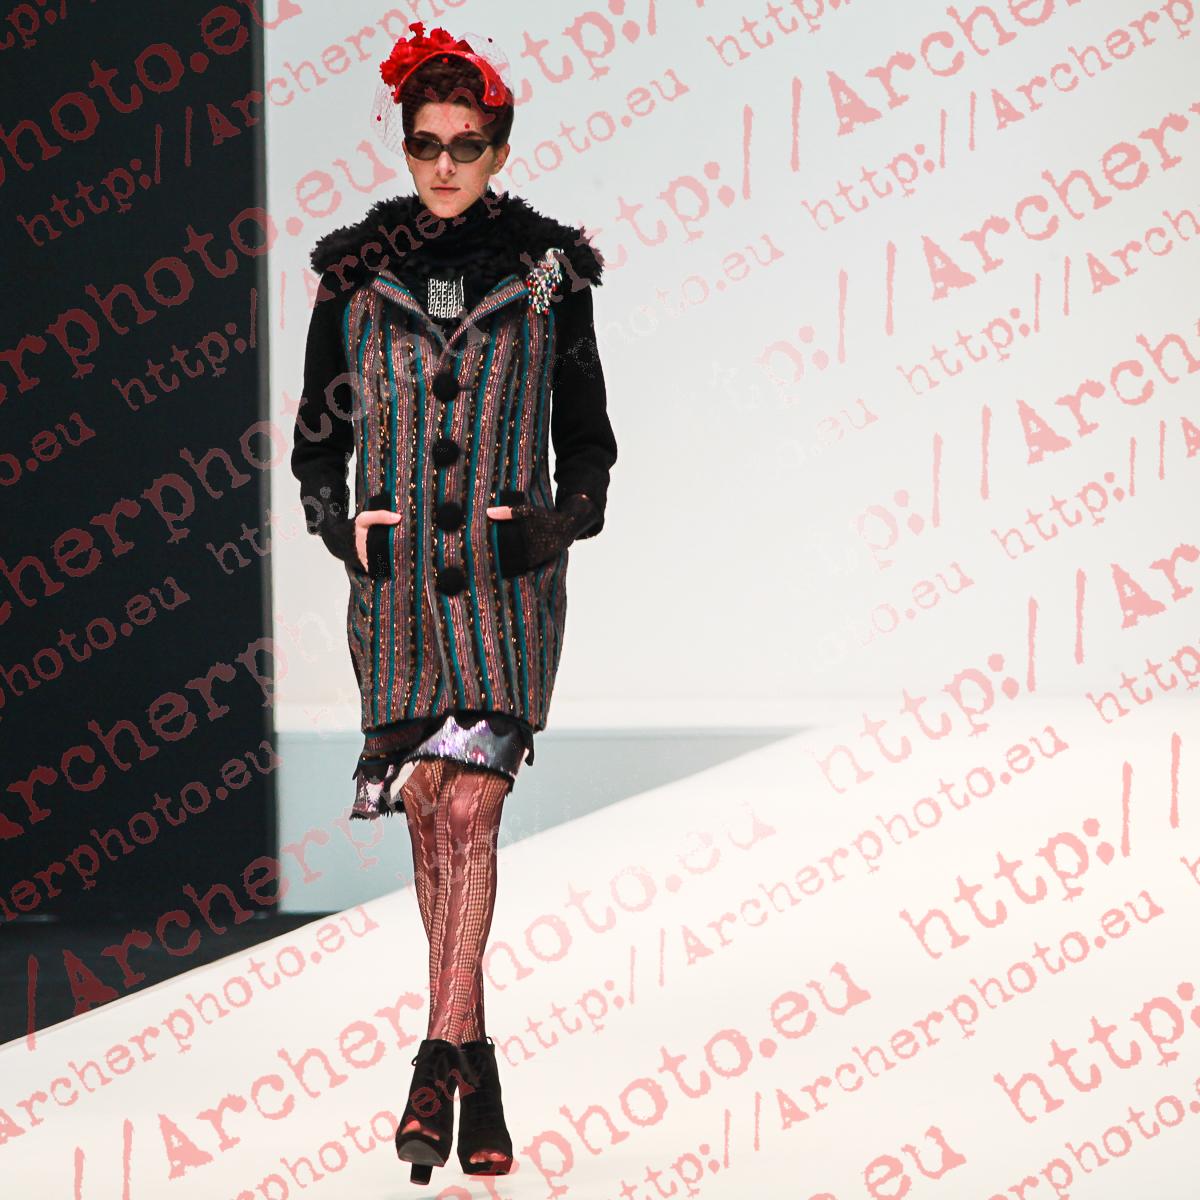 Eugenio Loarce, February 16th 2012 Valencia Fashion Week